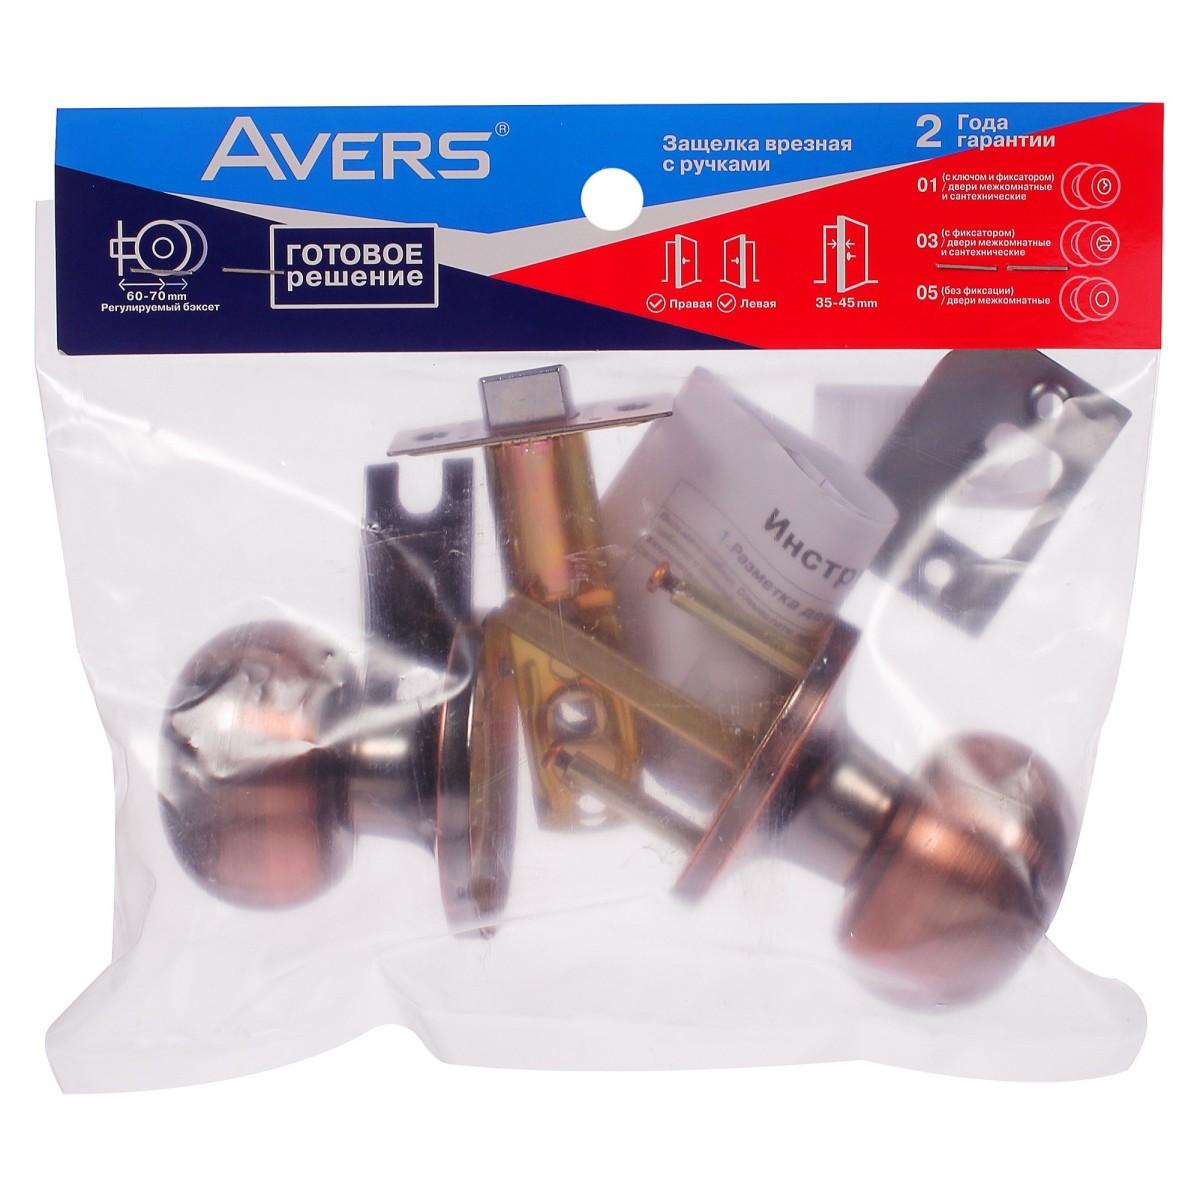 Ручка-Защёлка Avers 6082-05-Ac Без Запирания Сталь Цвет Старая Медь